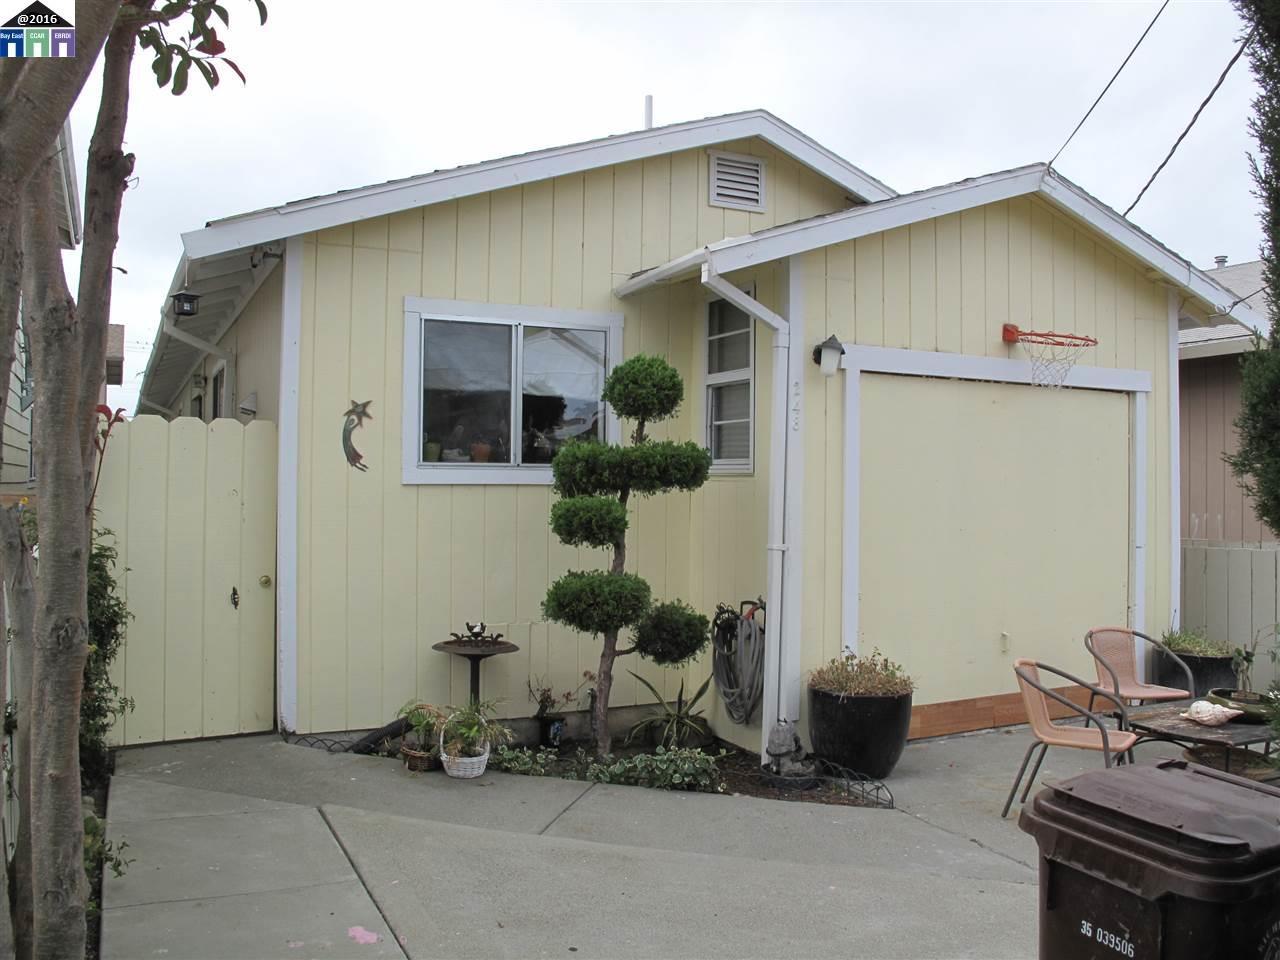 248 WILLARD AVE, RICHMOND, CA 94801